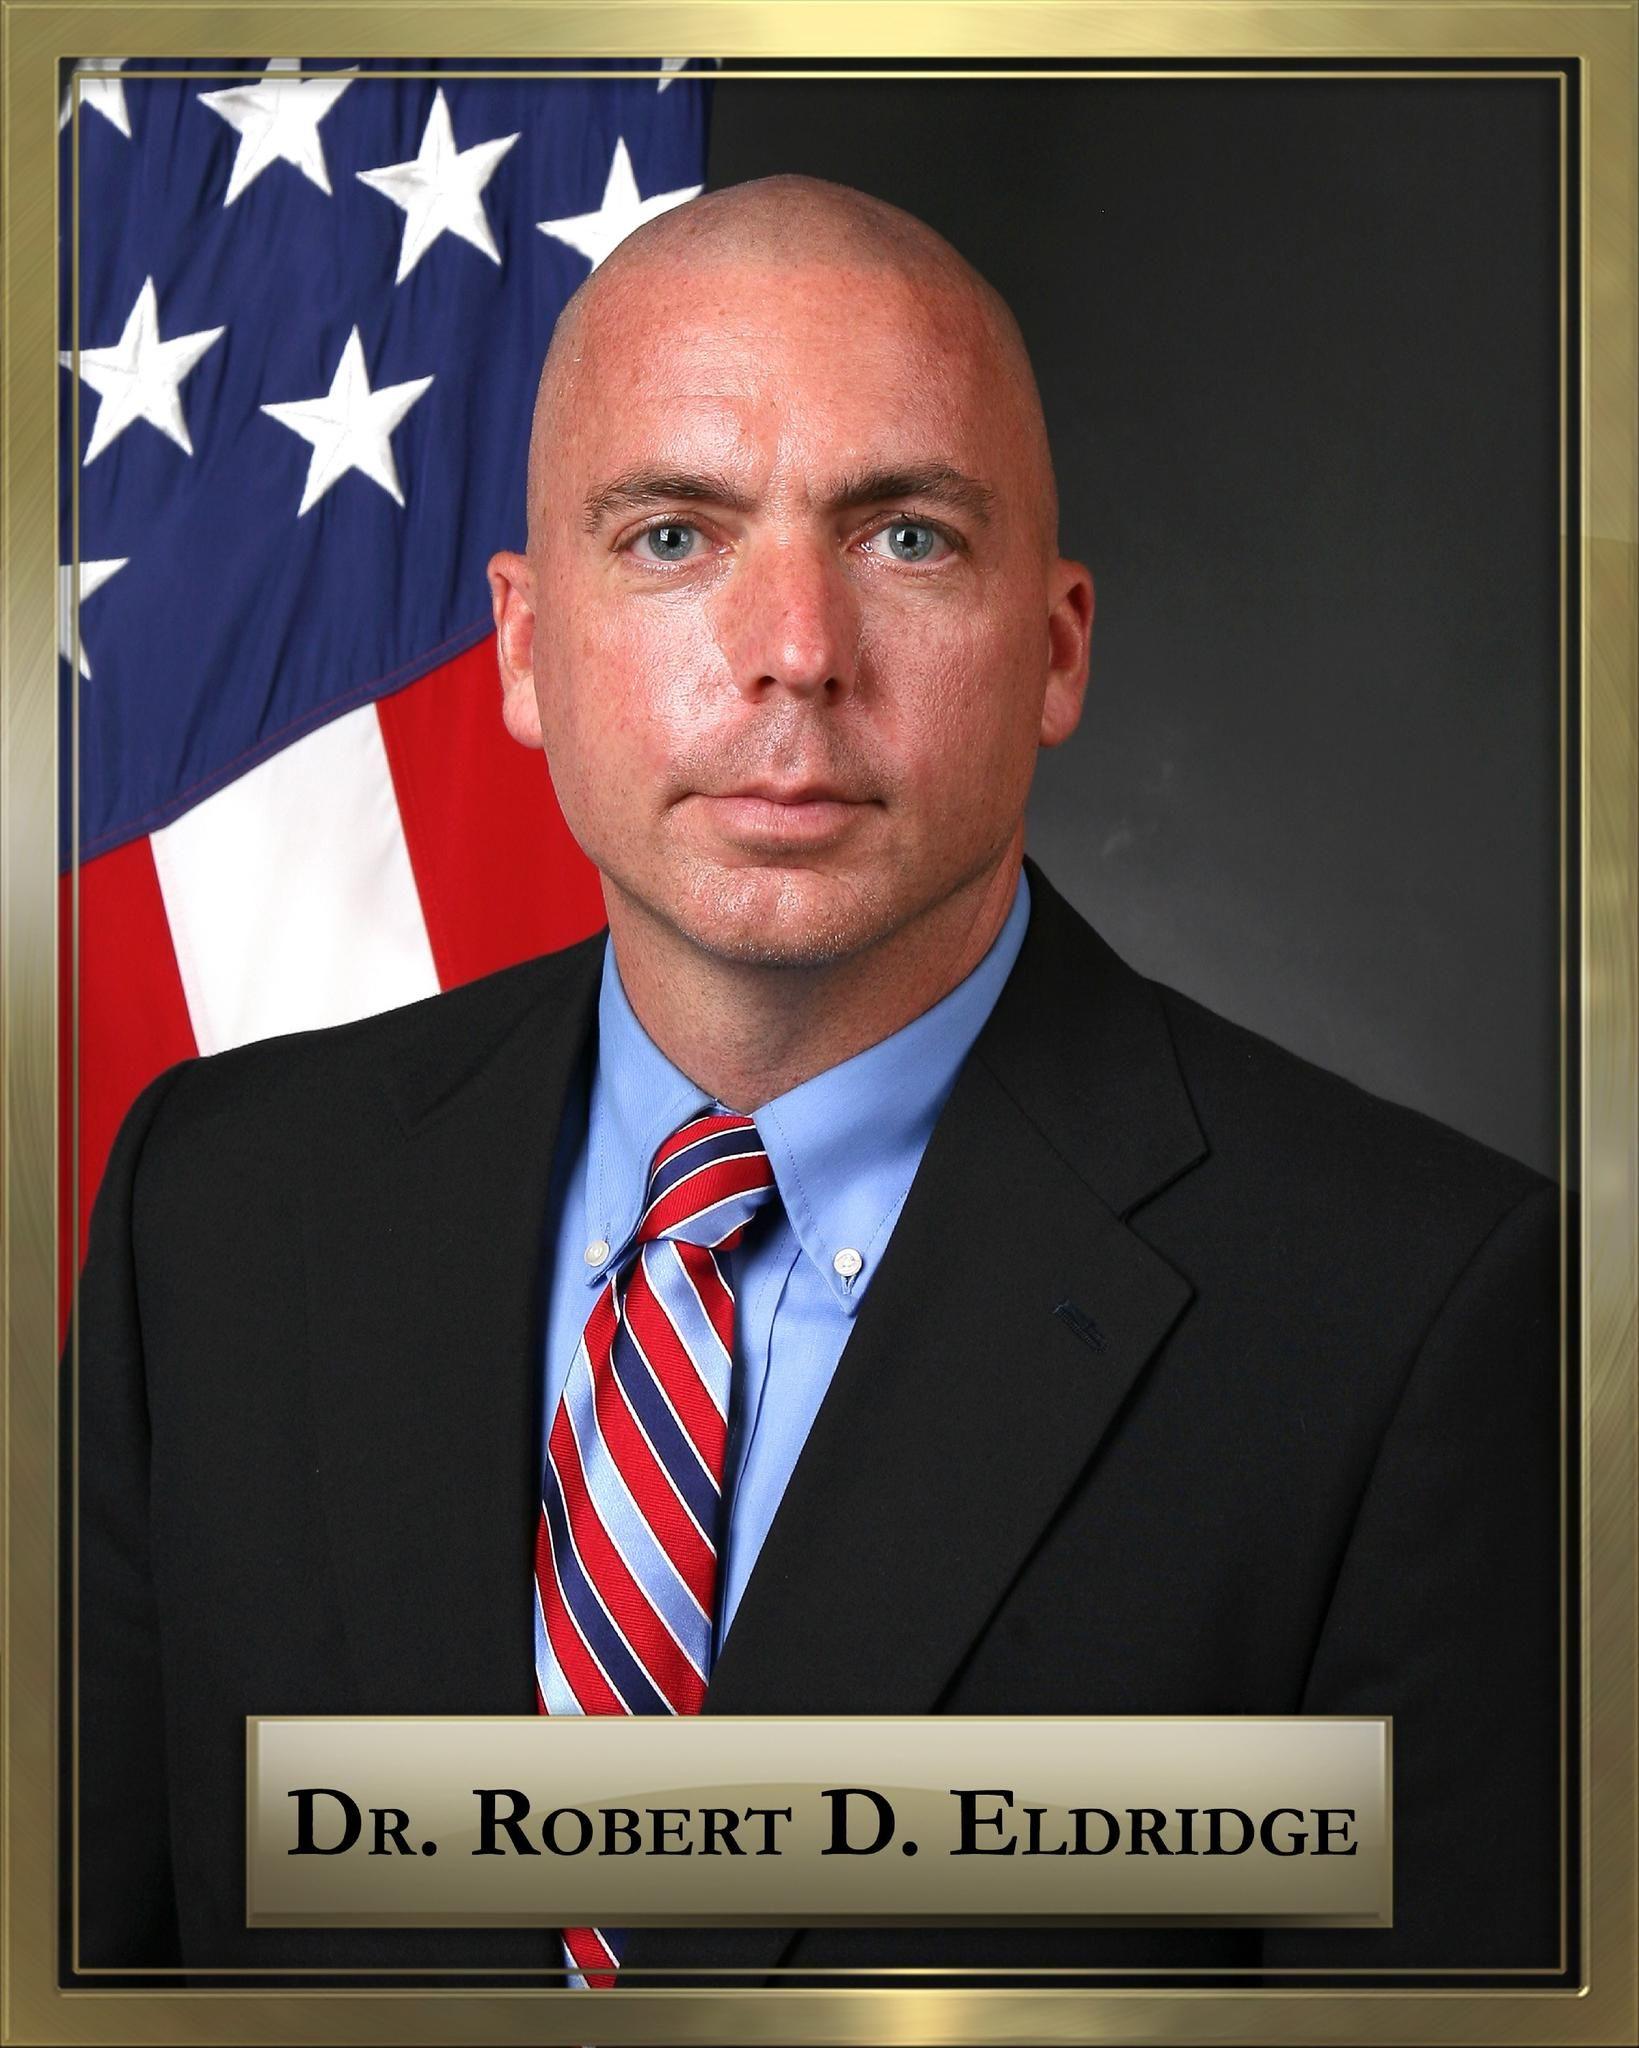 Robert D. Eldridge (ロバート・D・エルドリッヂ)